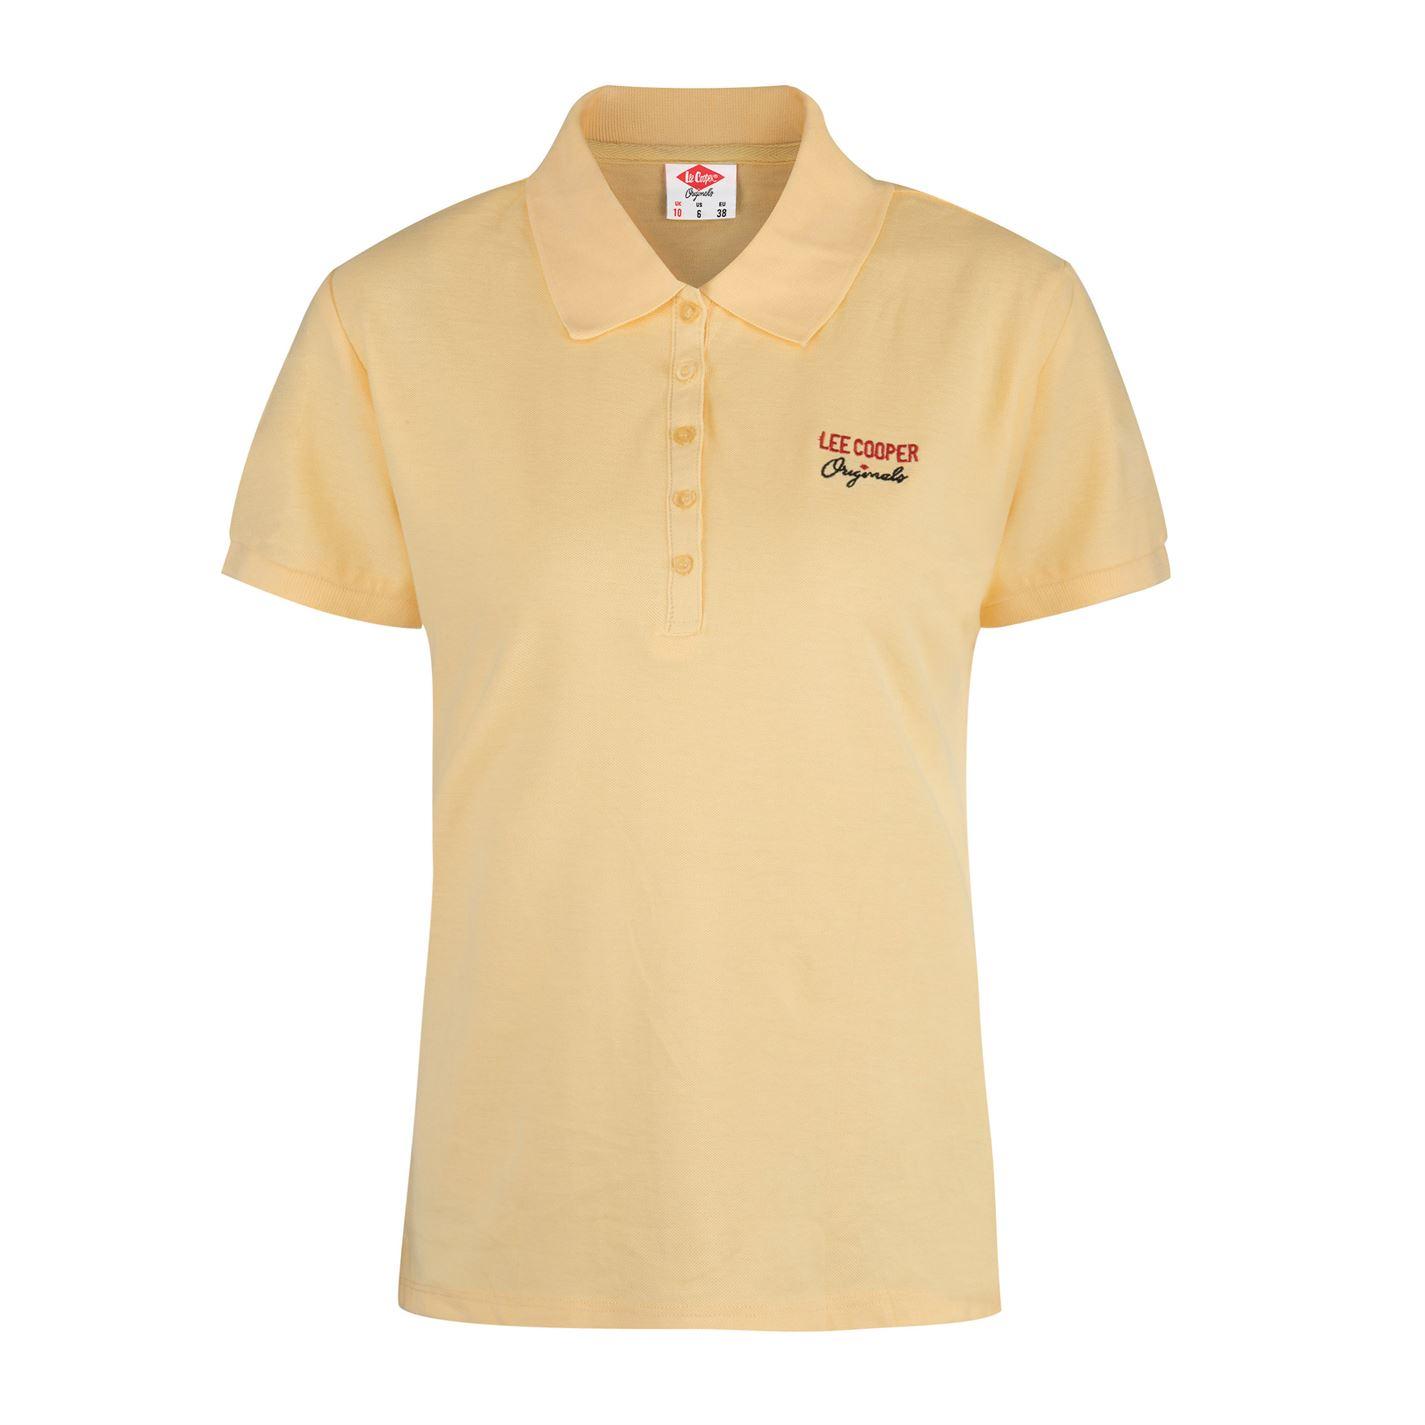 1dd7d9f6ca86 ... Cooper Plain Polo Shirt dámské Yellow. -5%. Lee ...